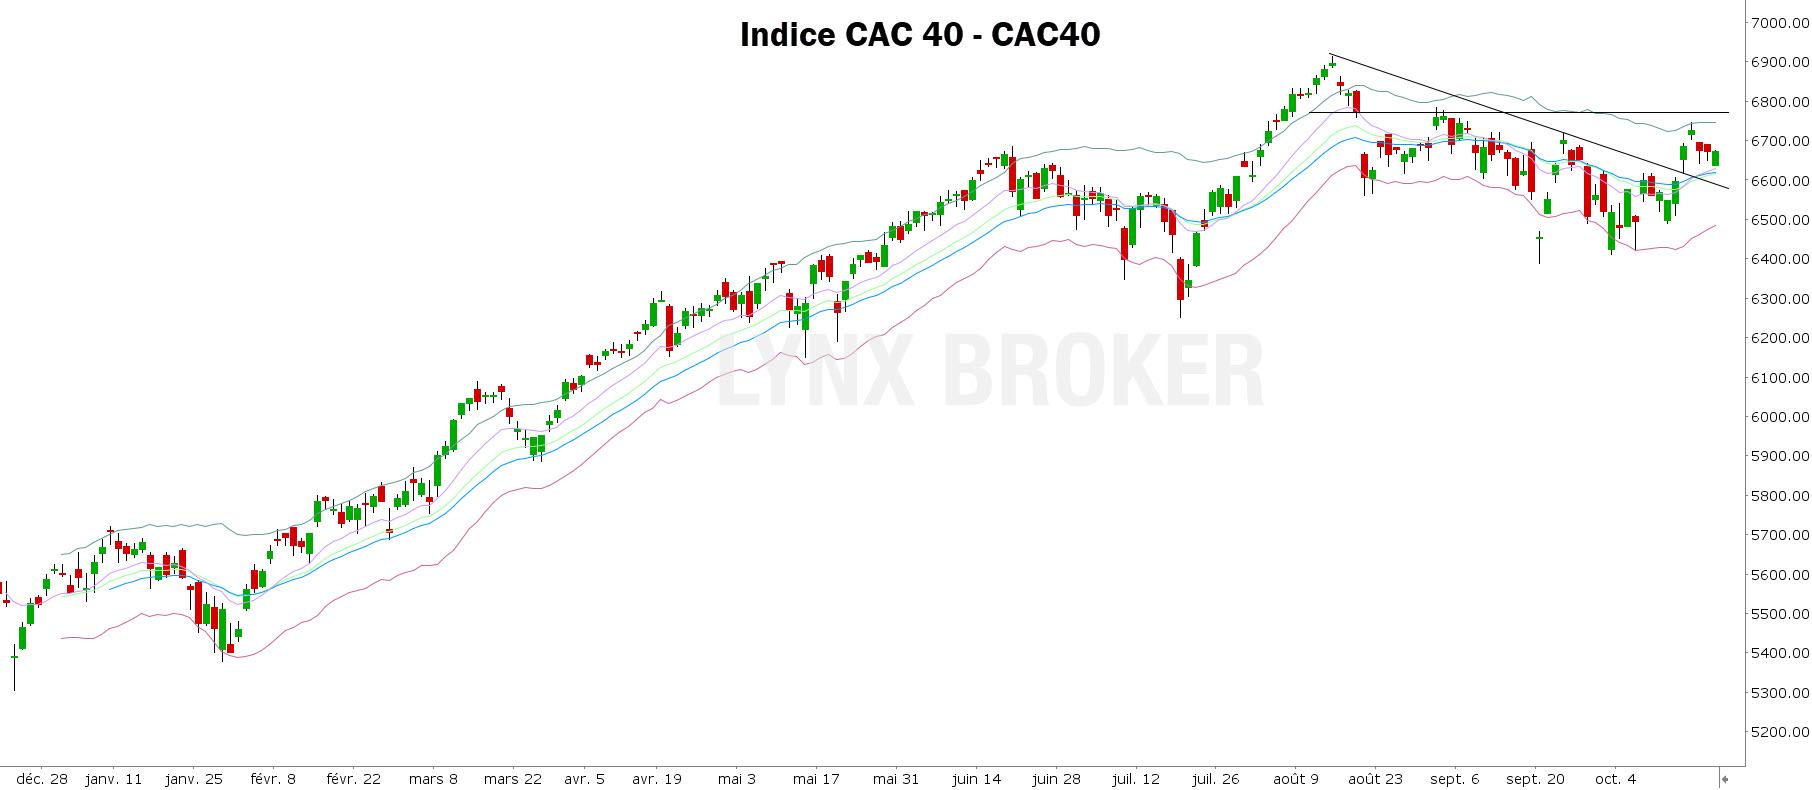 analyse technique CAC 40 - indice CAC 40 - 20102021